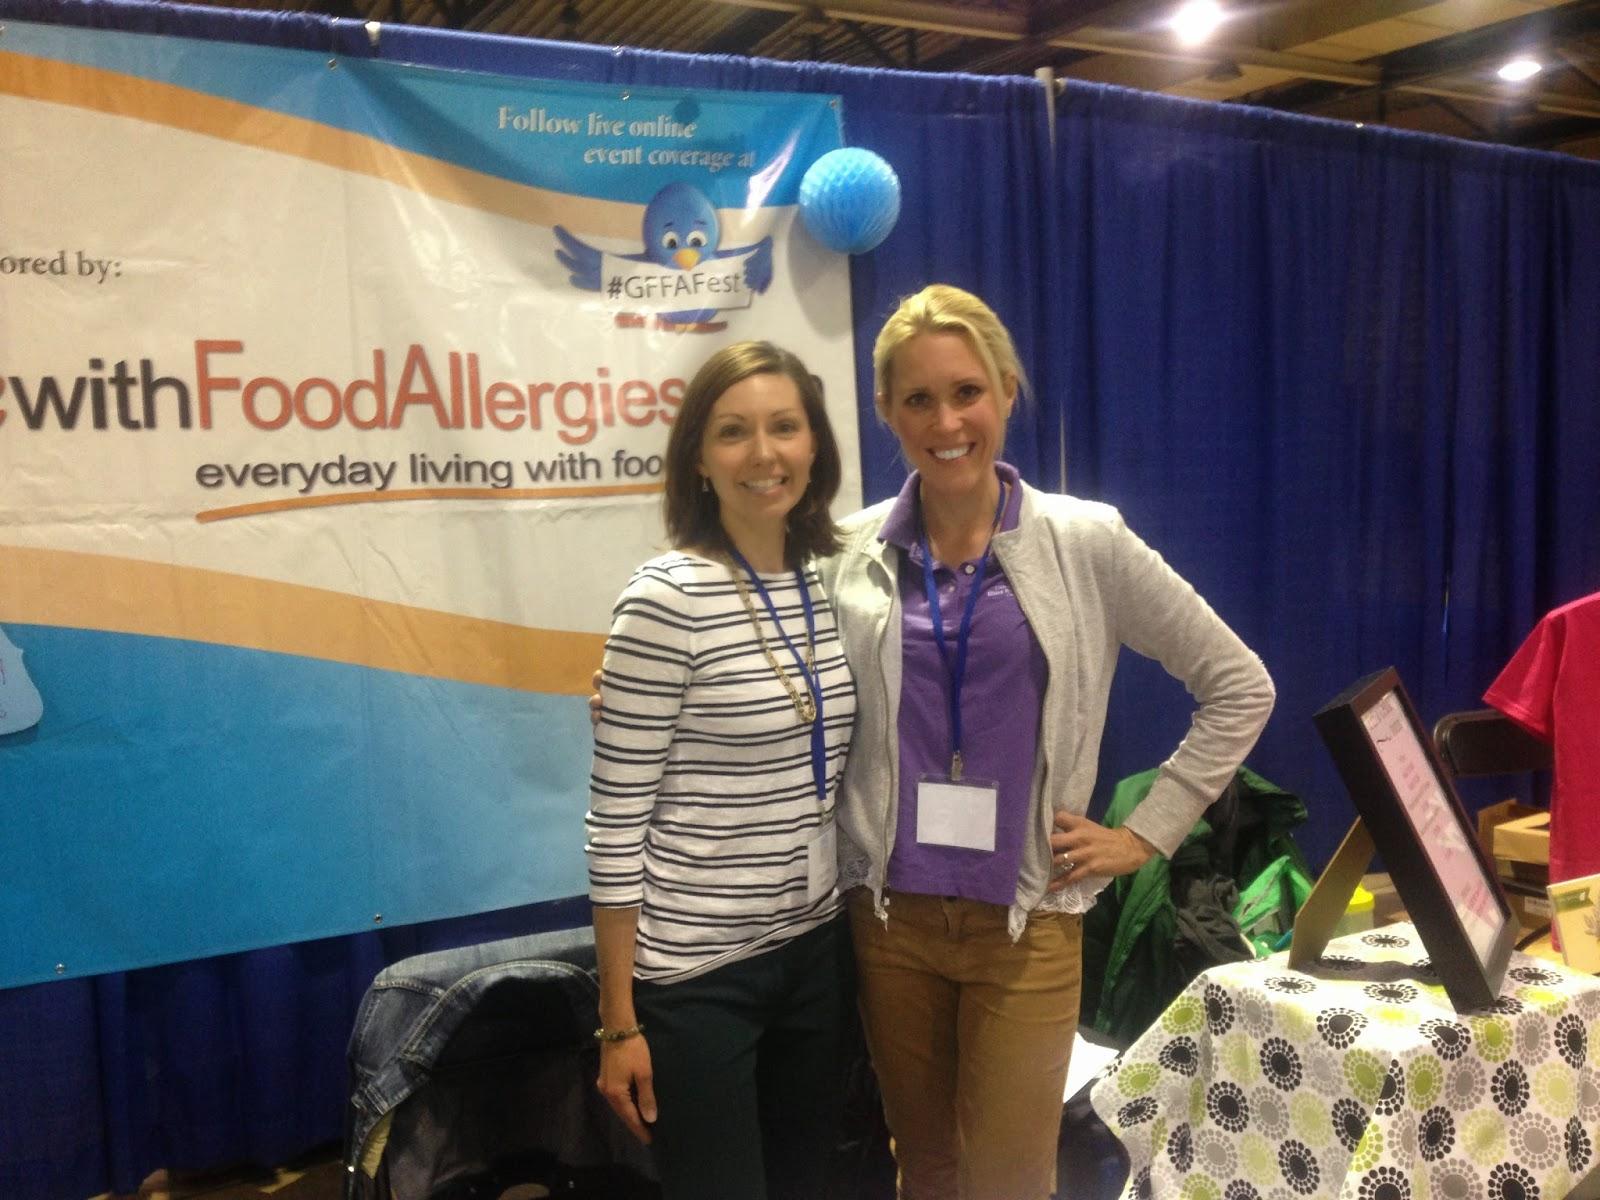 Try Allergy Free Environment for Better Health